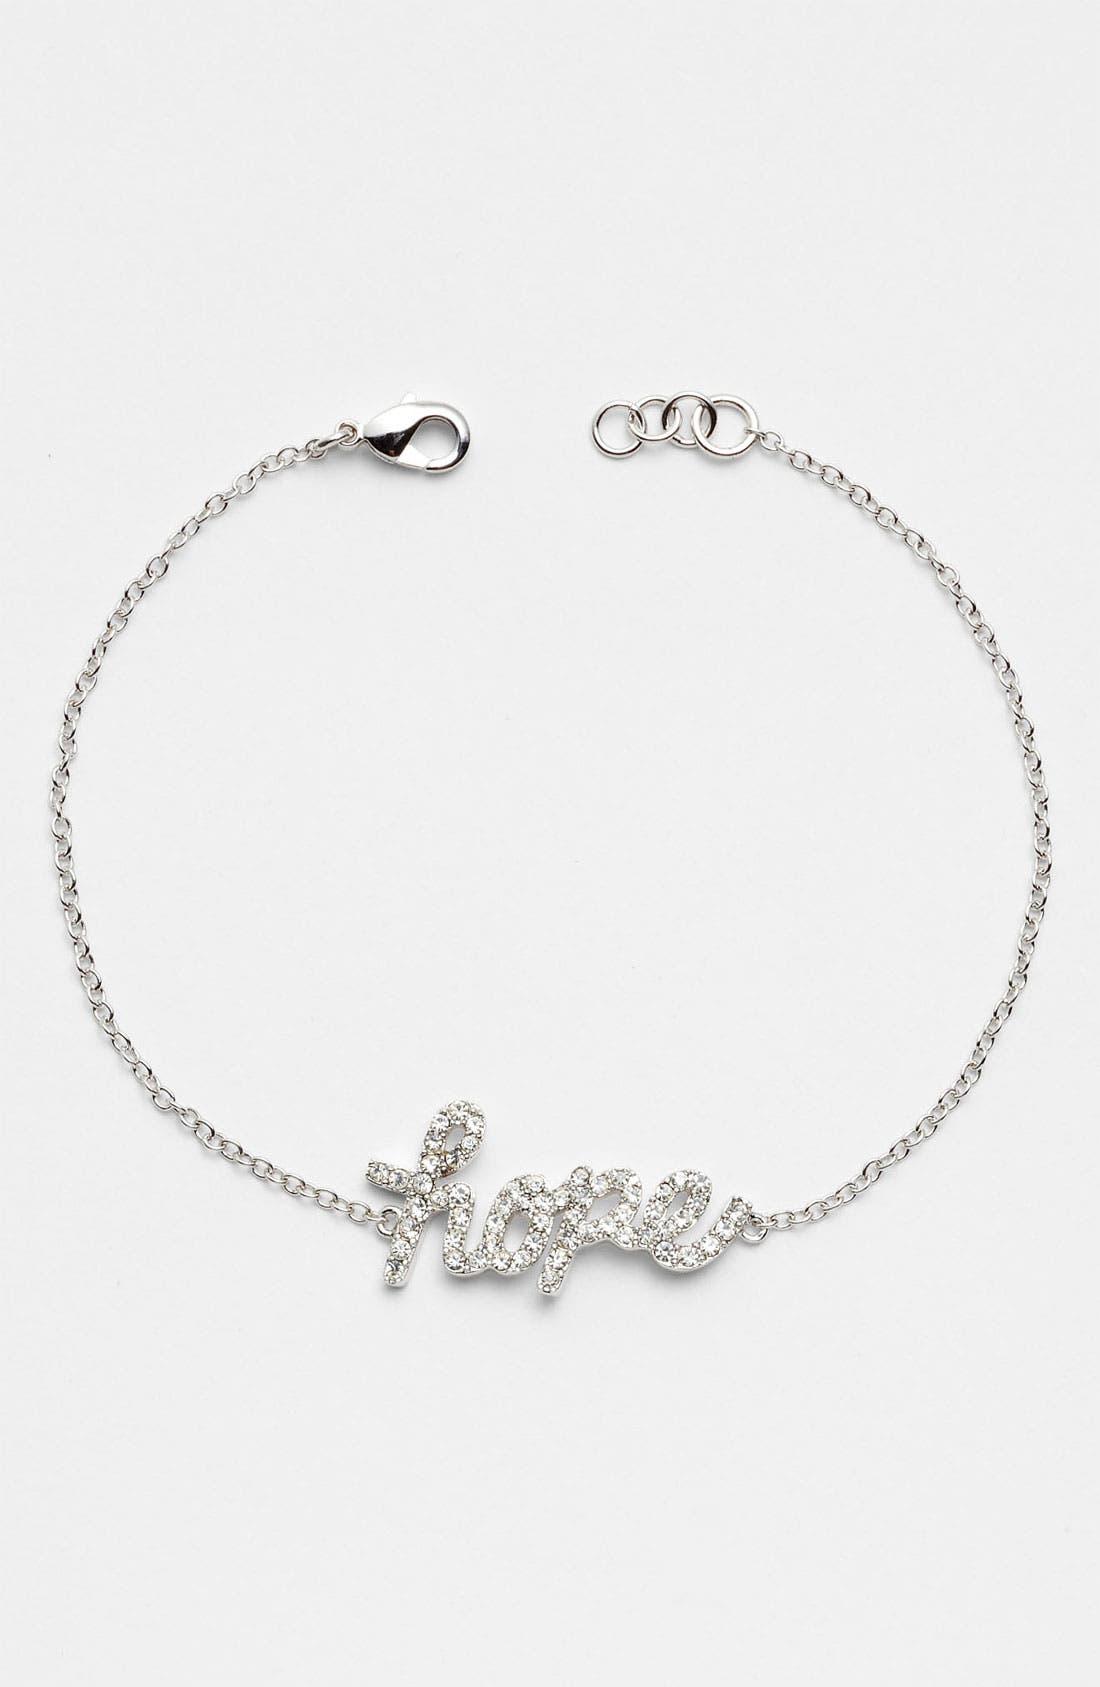 Main Image - Ariella Collection 'Messages - Hope' Script Station Bracelet